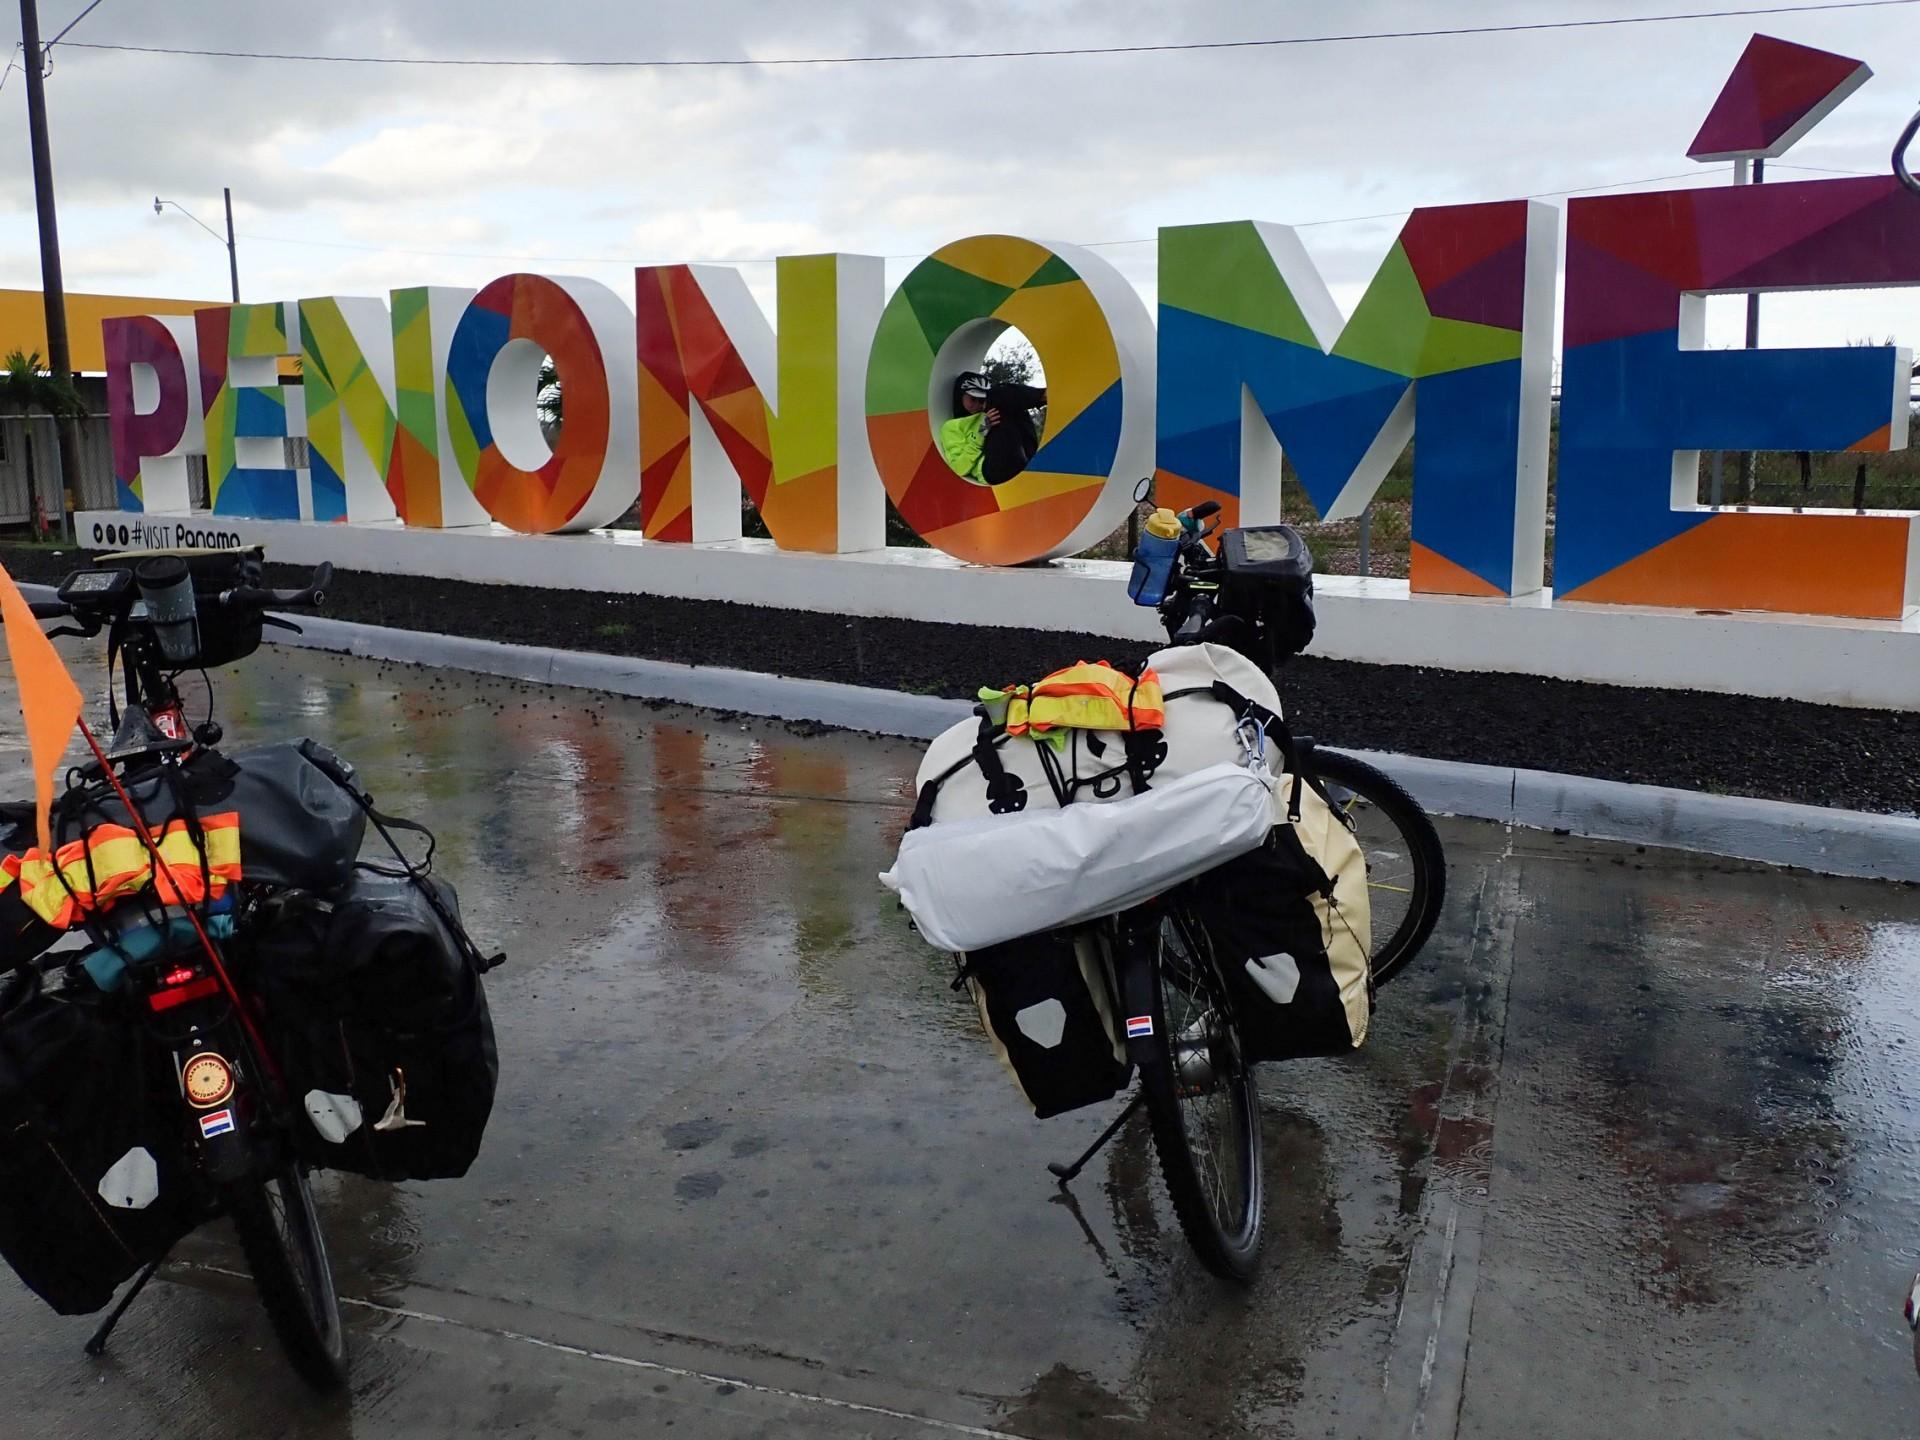 2018-07-04 Santiago_Penonome-25